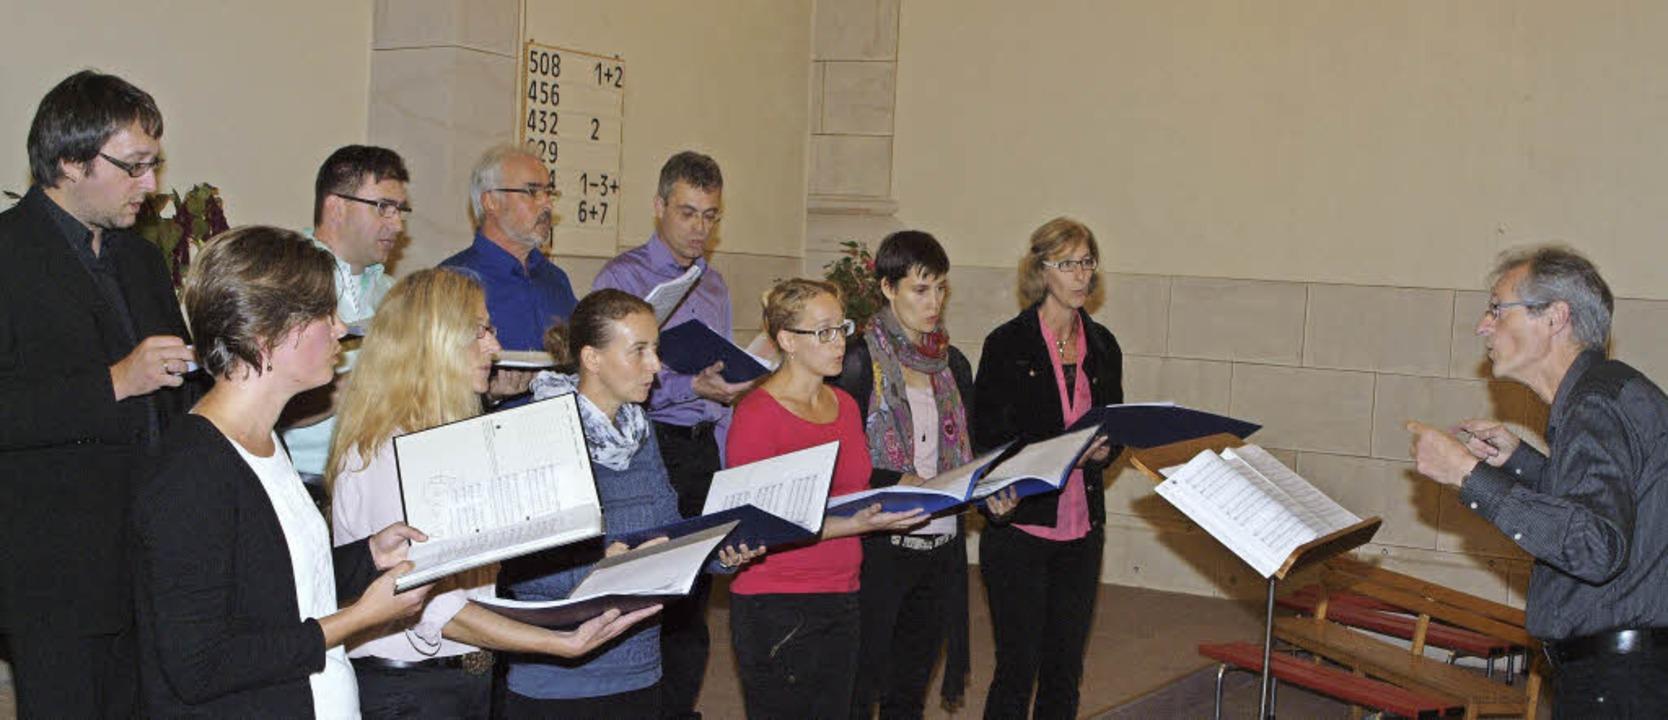 Viel Beifall erhielt der Kenzinger Chor Tonart beim jüngsten Kirchenkonzert.  | Foto: Michael haberer